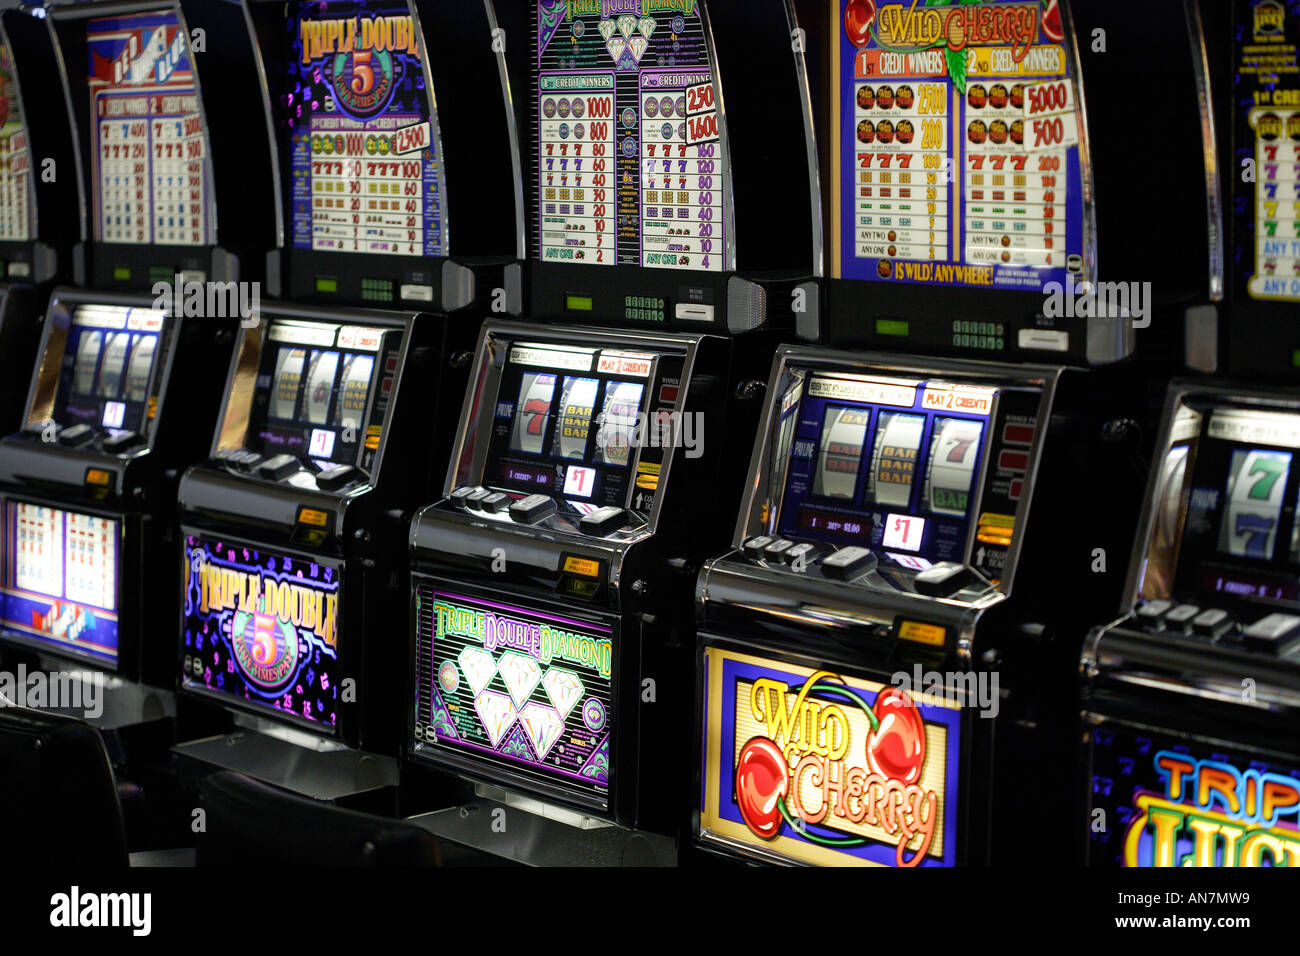 one armed bandit slot machine